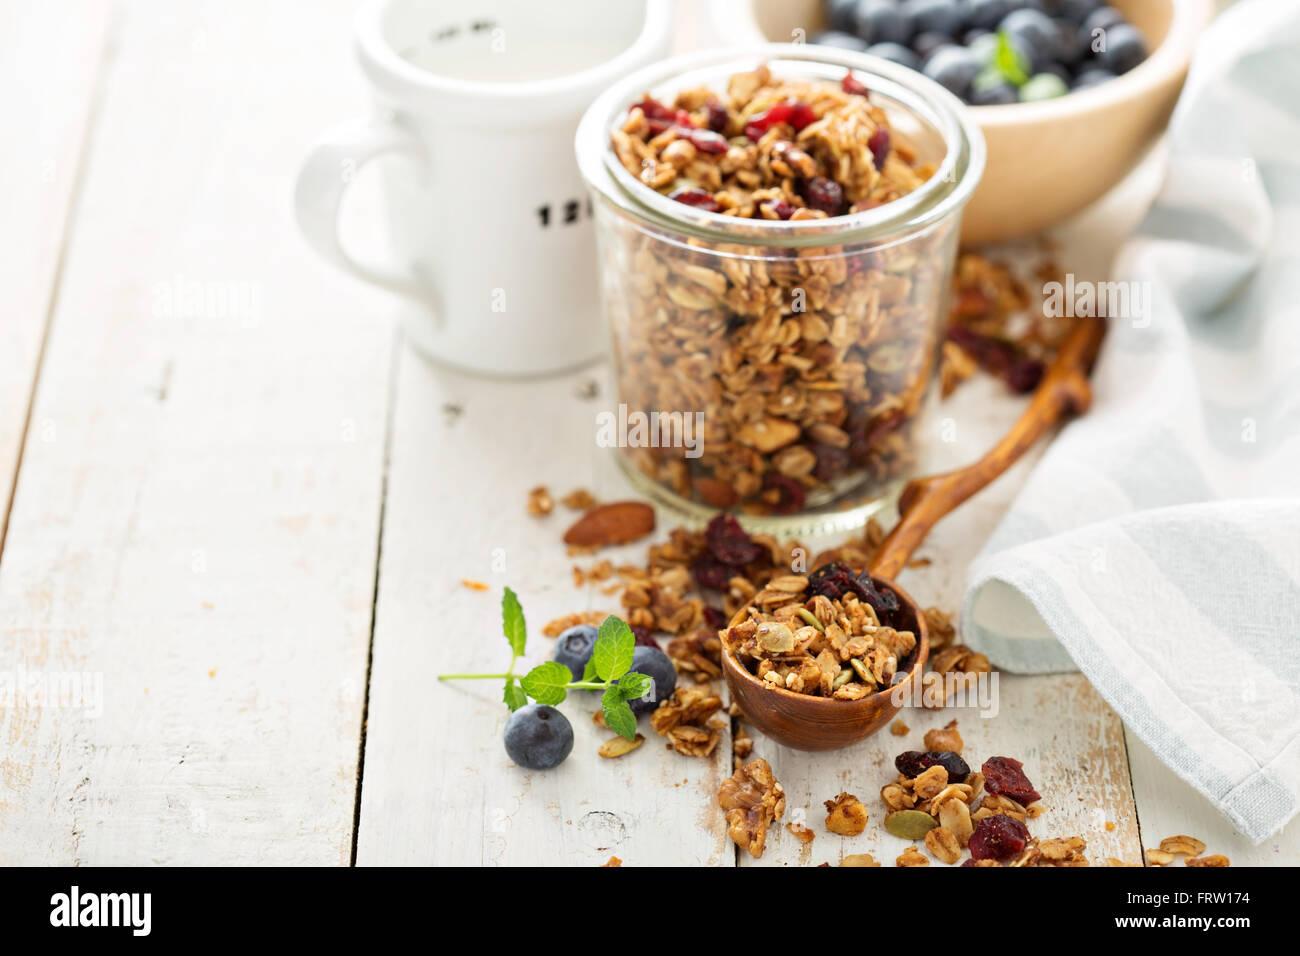 Homemade granola with milk for breakfast - Stock Image